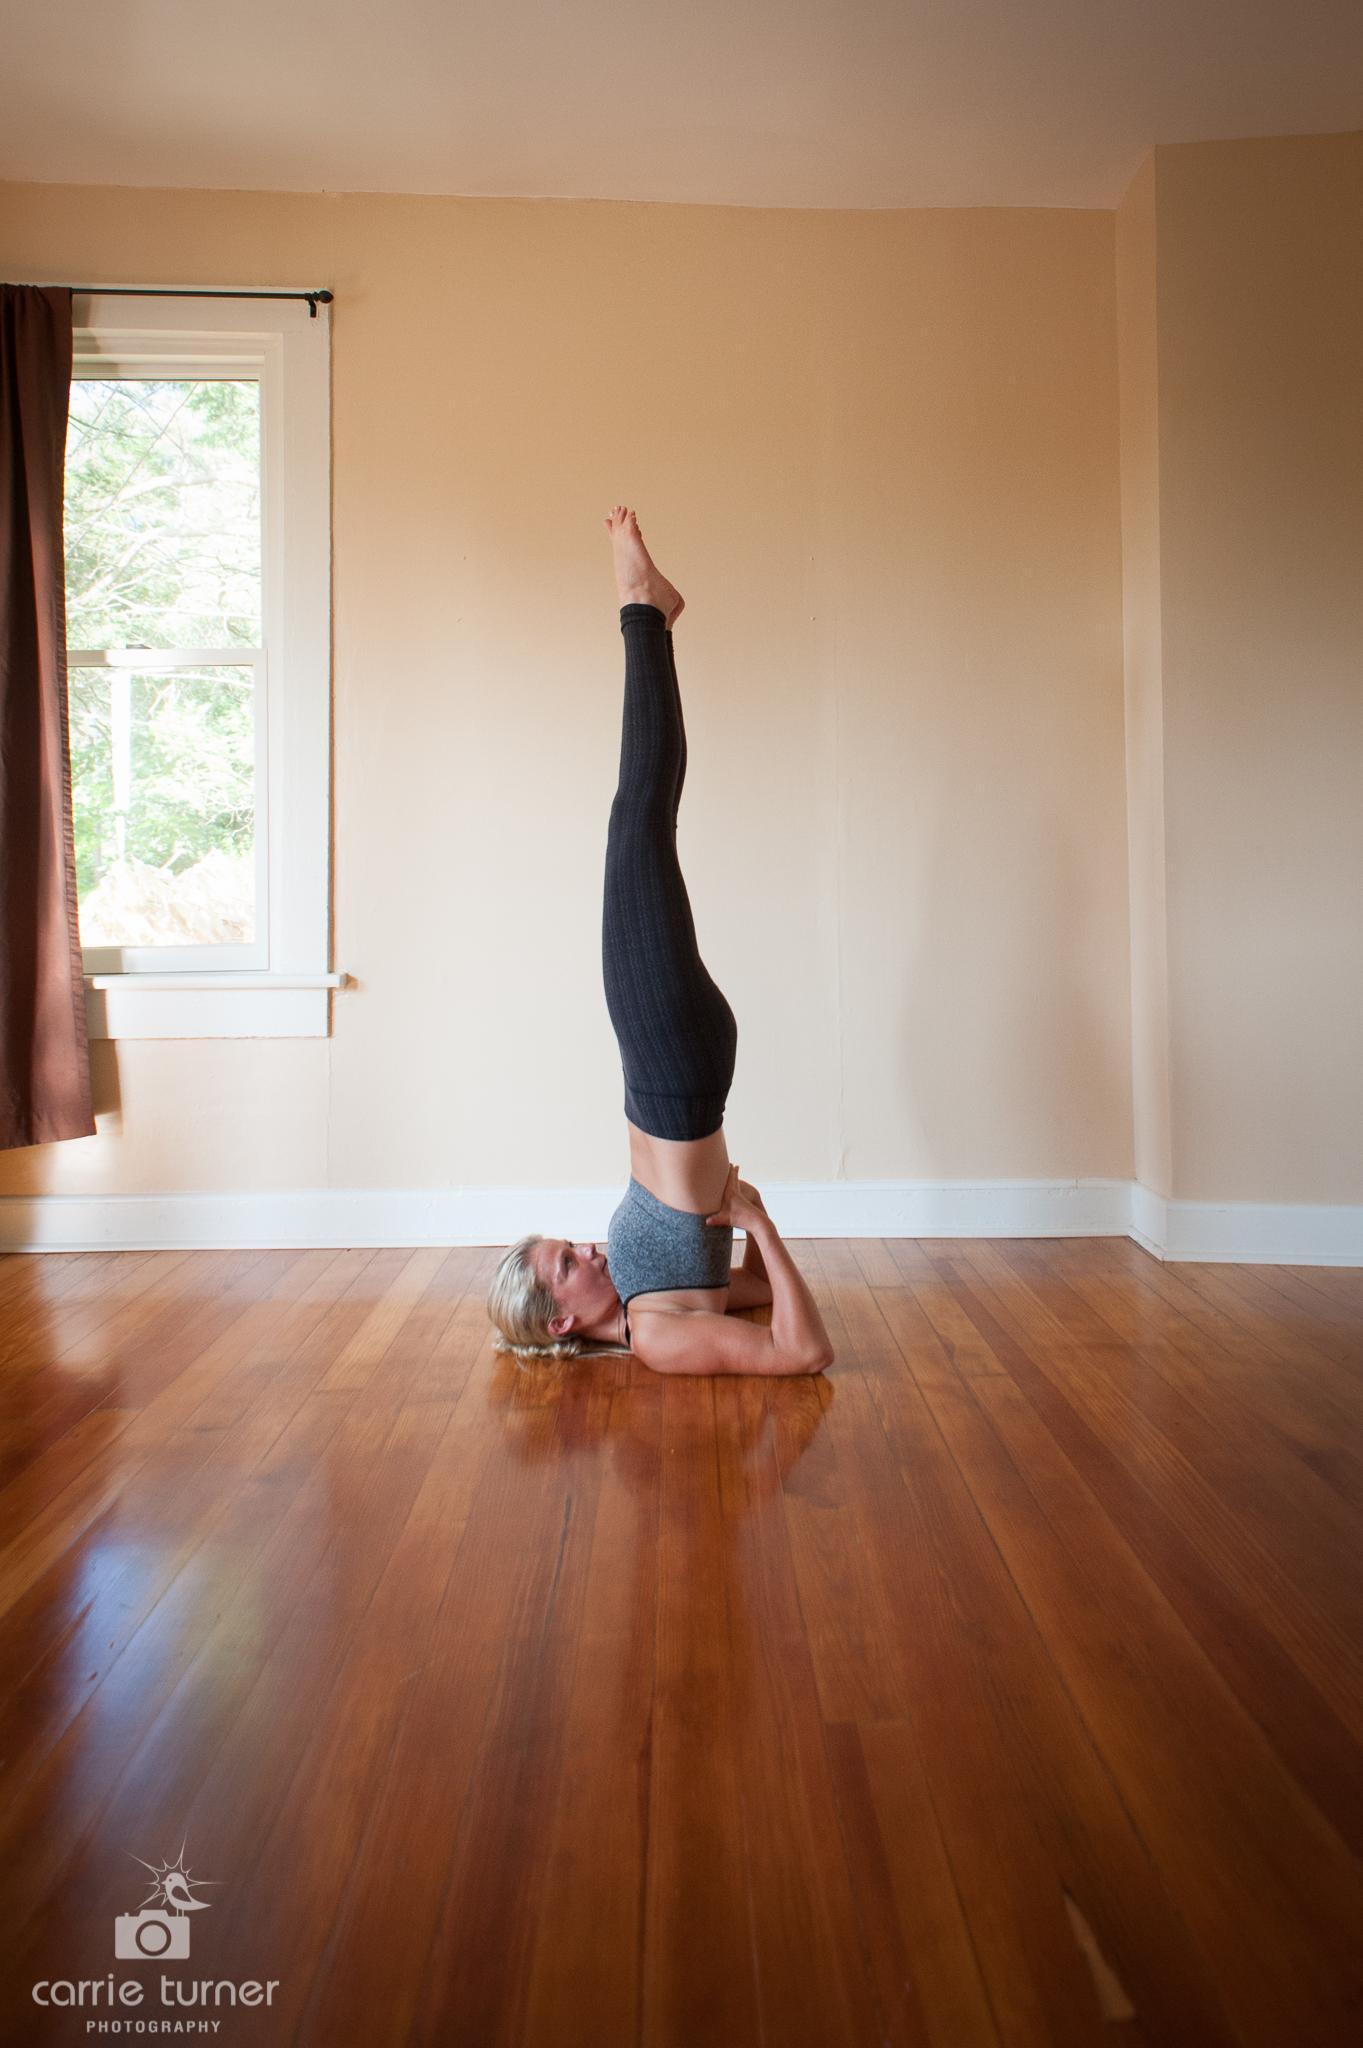 Maggie_yoga and portraits-82.jpg